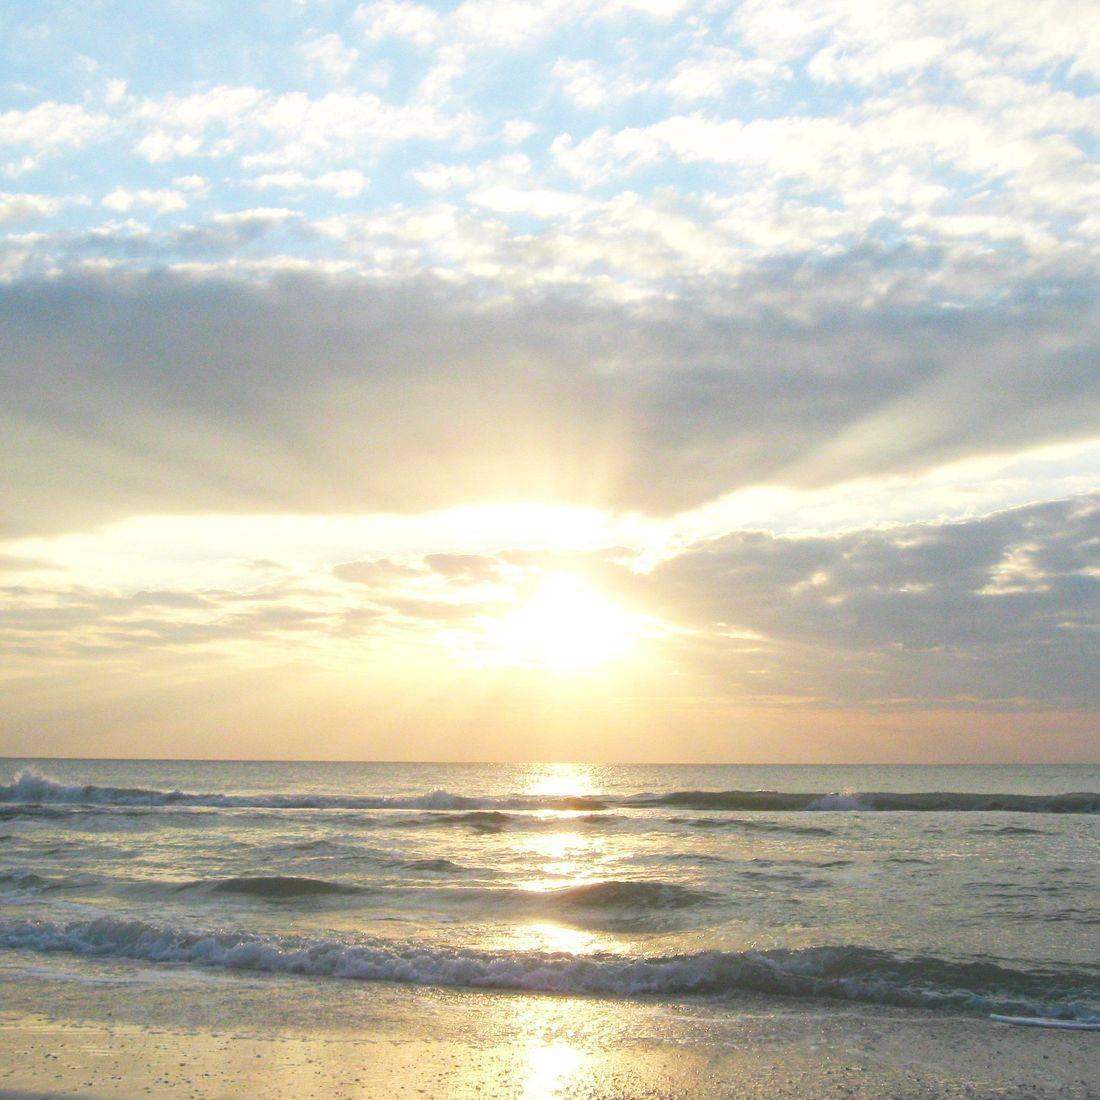 Water, Ocean, Sun, Sunset, Clouds, Sea, Beach, Waves, Anna Maria Island, Bradenton, Florida